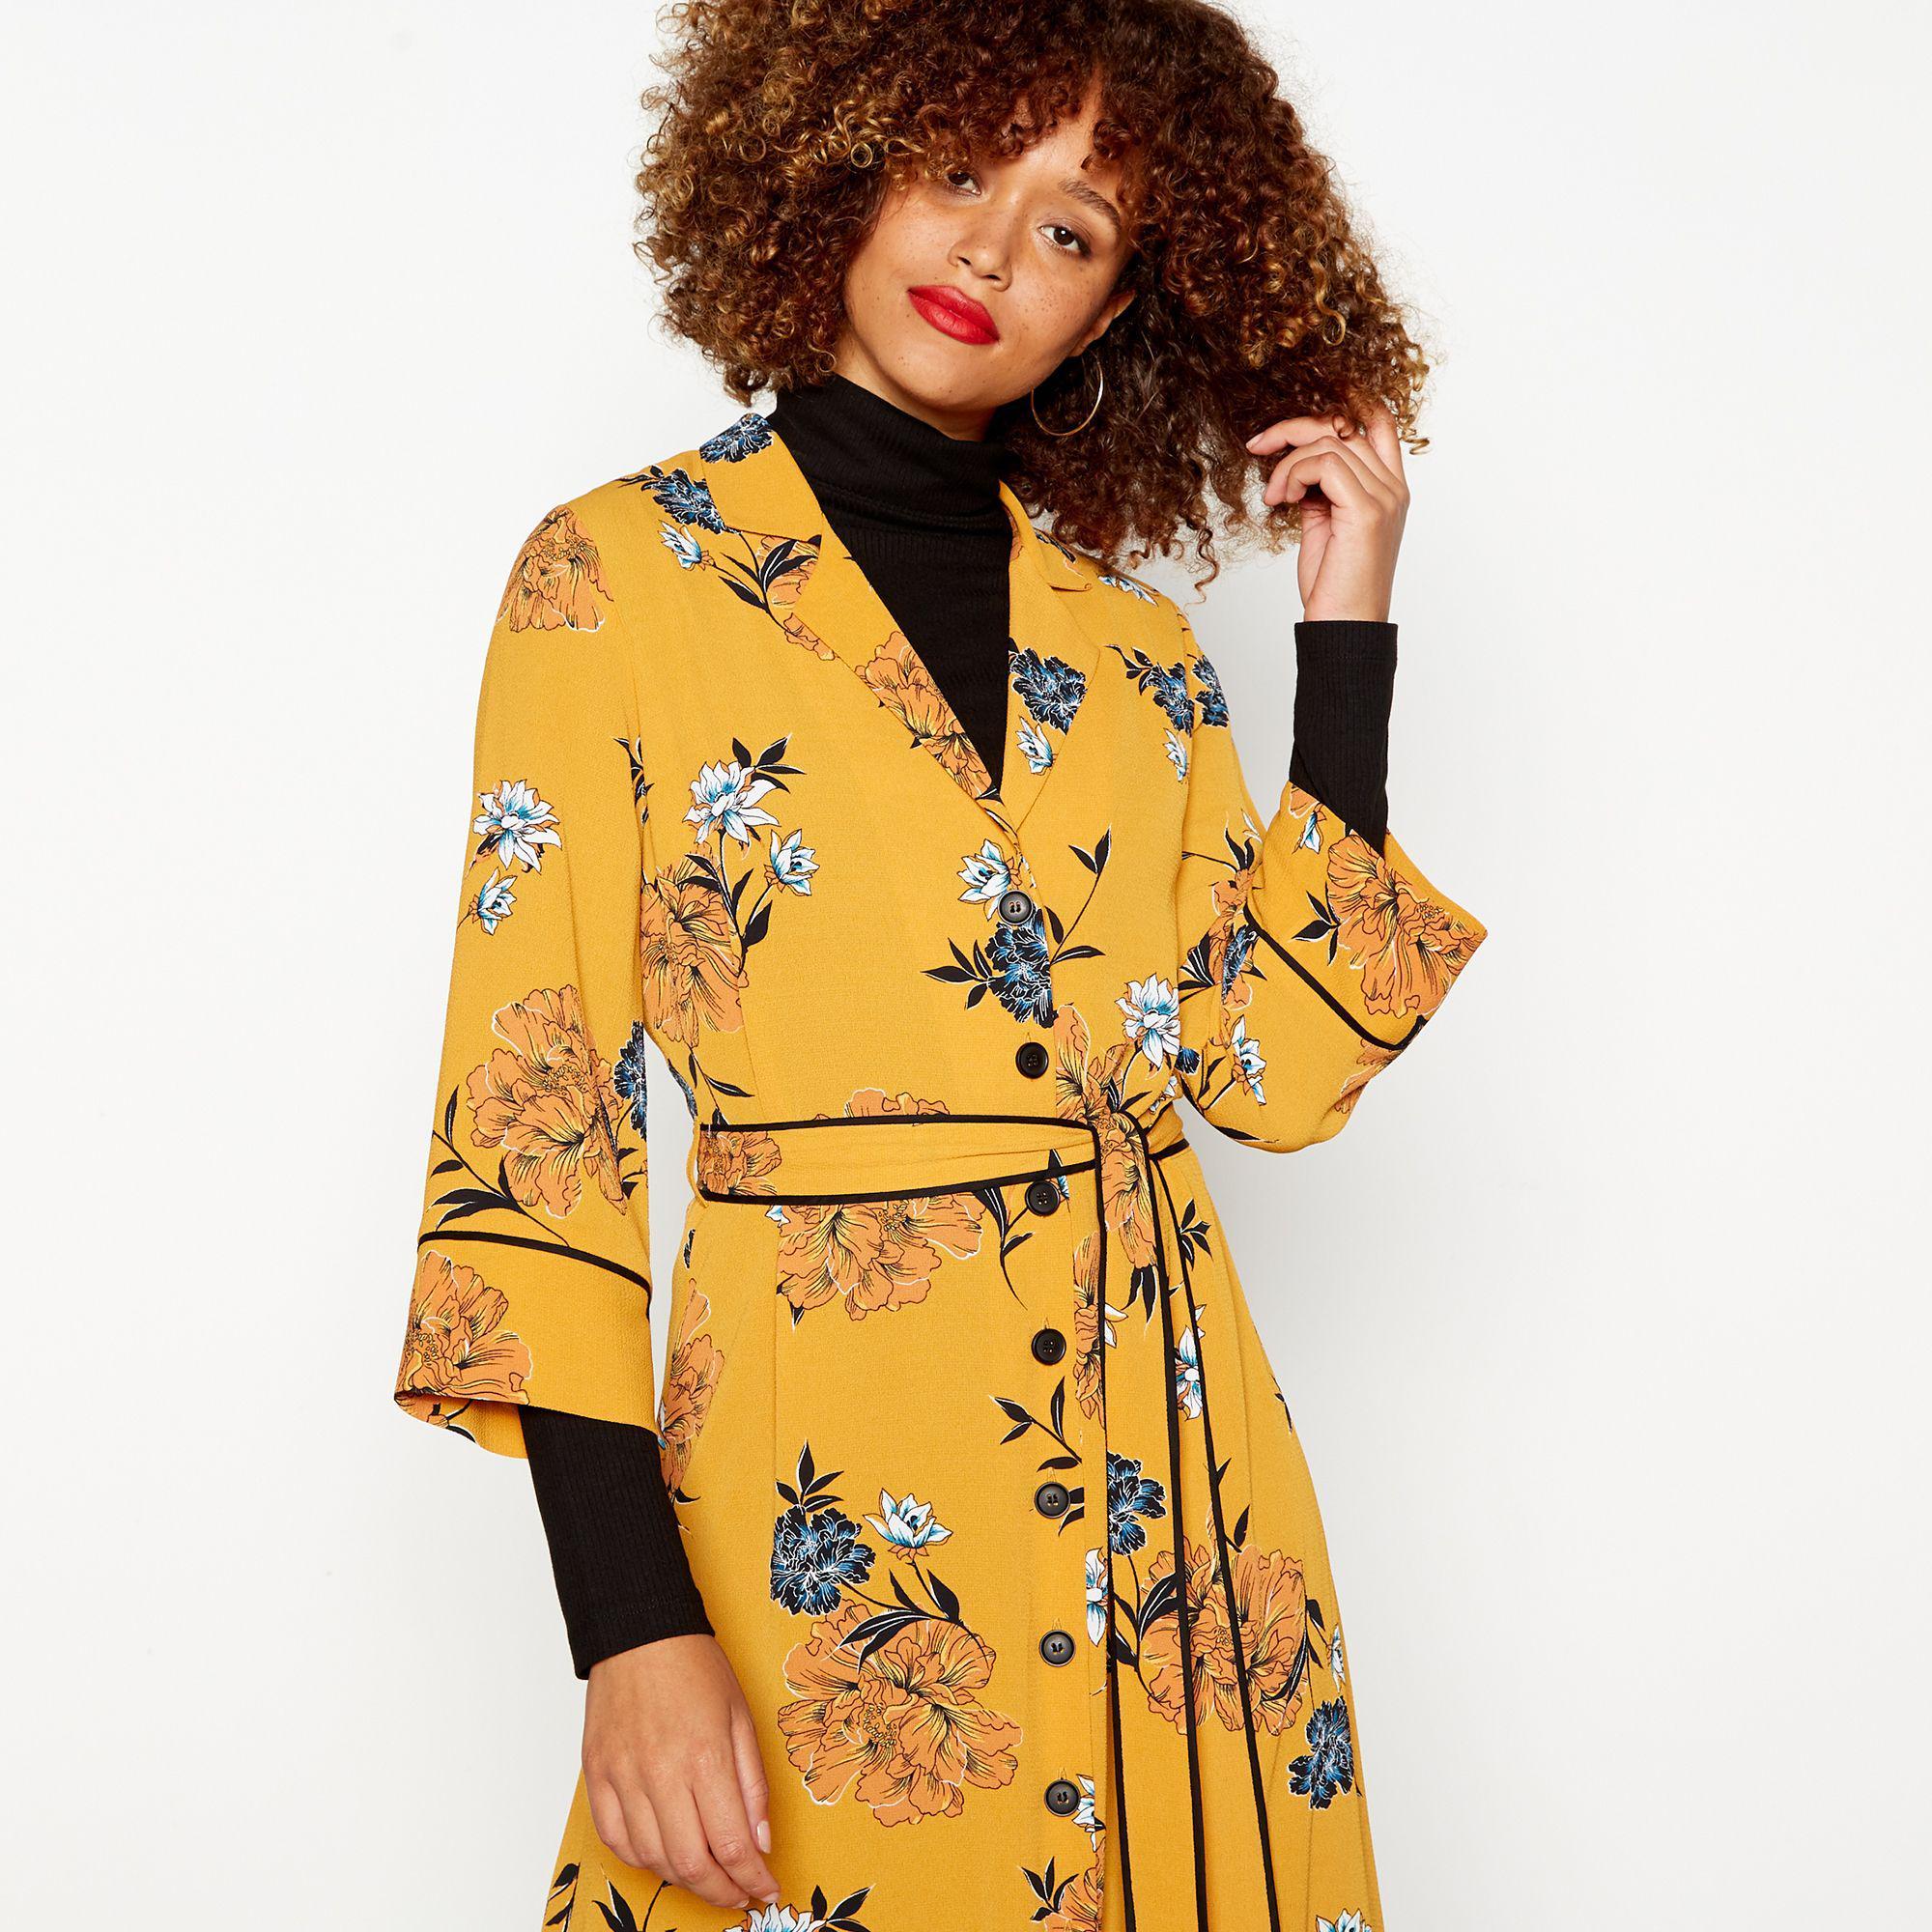 172e50b90a067 Red Herring Dark Yellow Floral Print Crepe Midi Dress in Yellow - Lyst